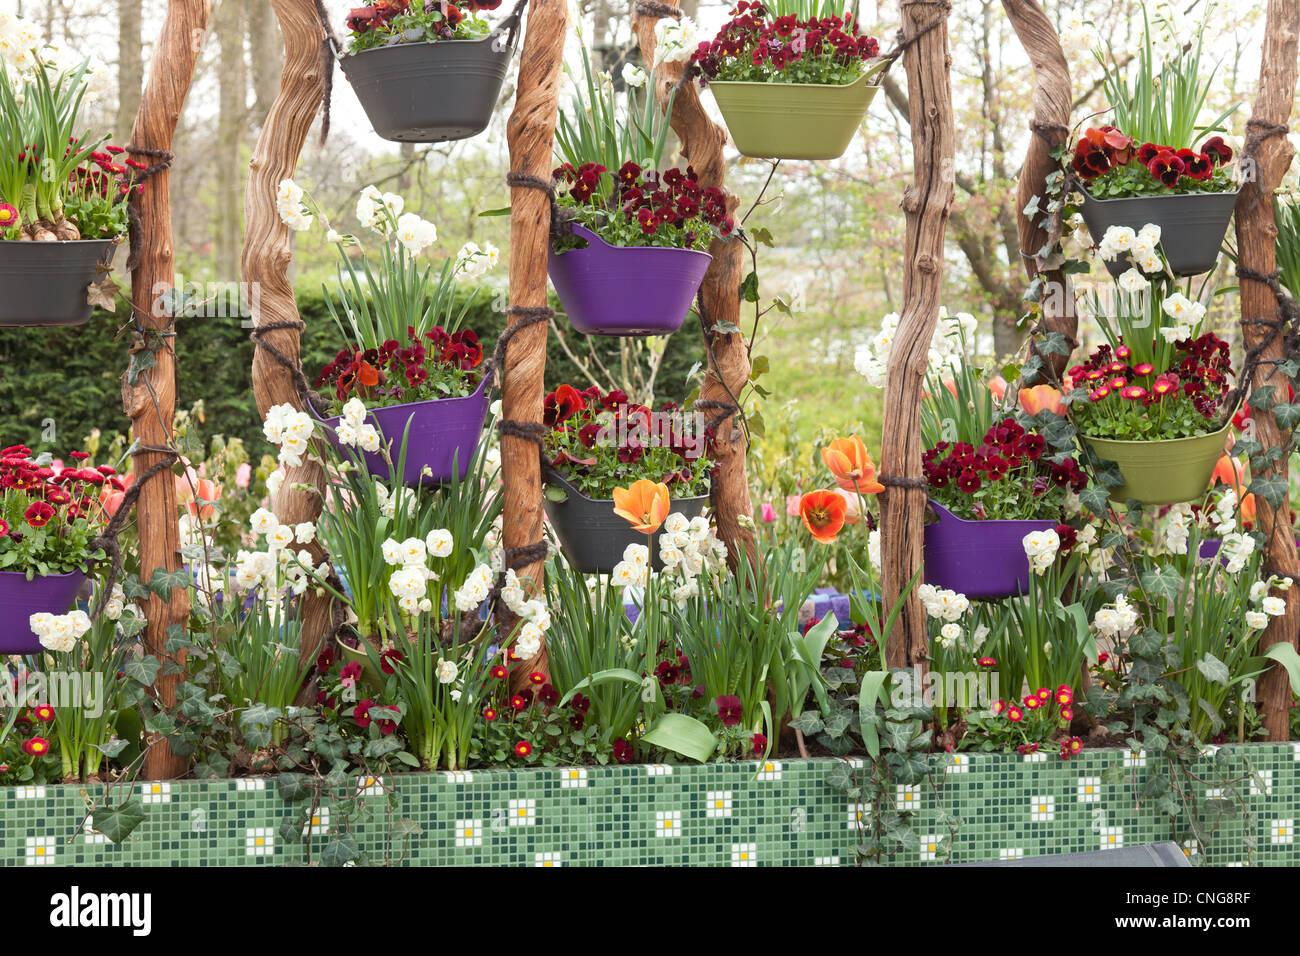 Holland, Lisse, Keukenhof, hanging pots with Pansies. - Stock Image